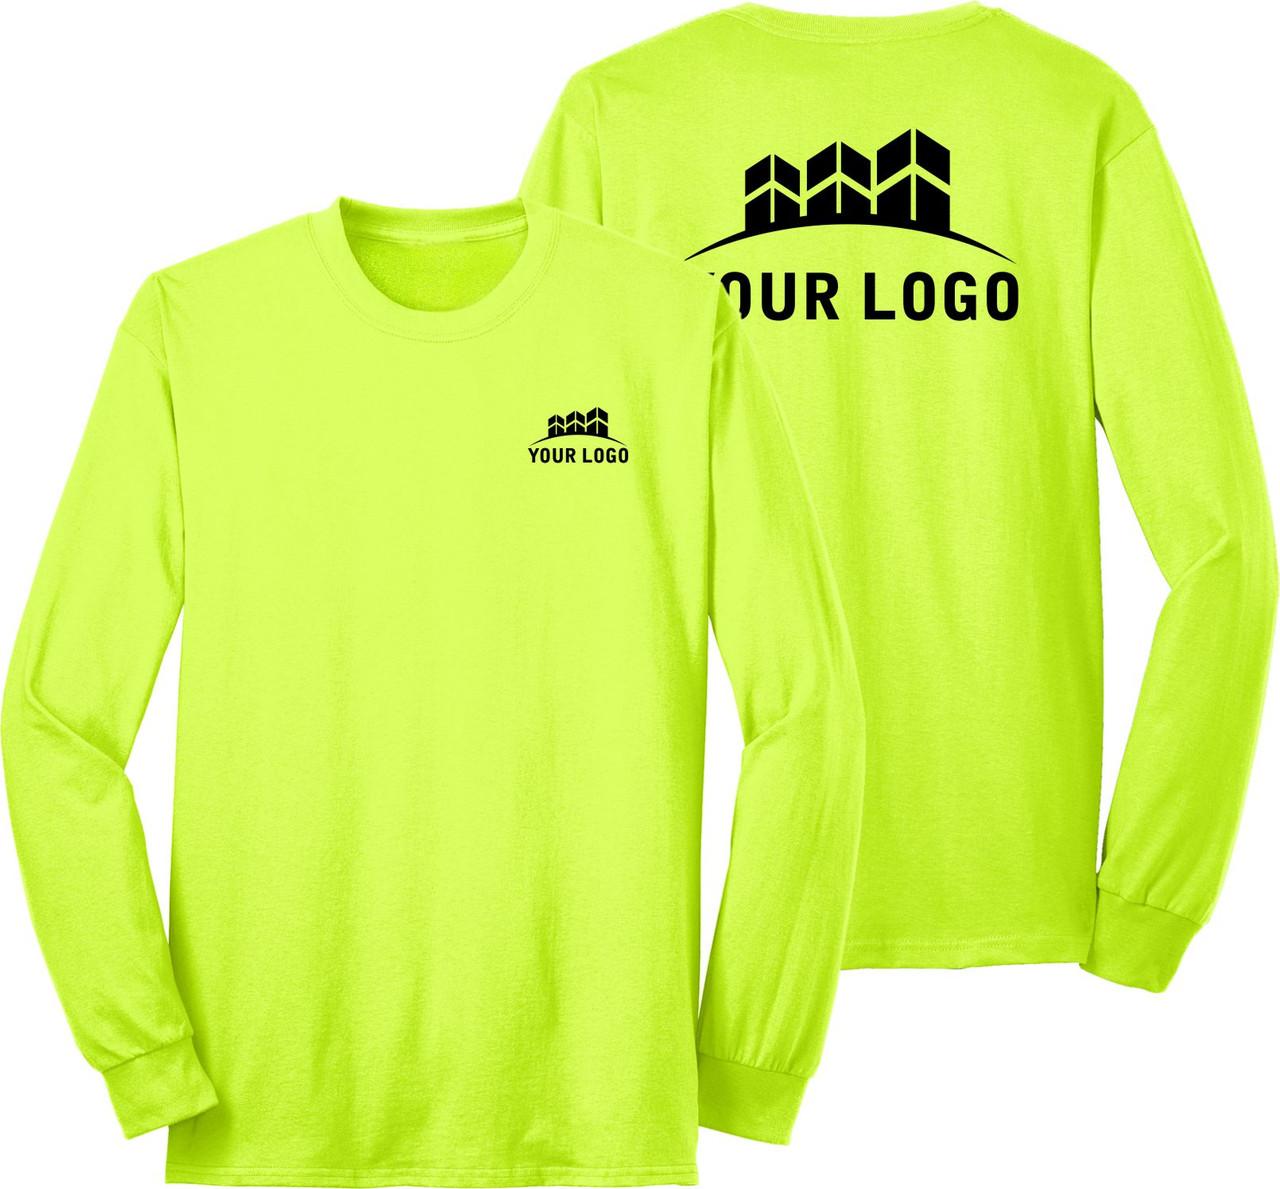 Safety Green Lonh Sleeve Shirt with Logo | Custom High Visibility Long Sleeve T-Shirt | Custom Construction Safety Shirt